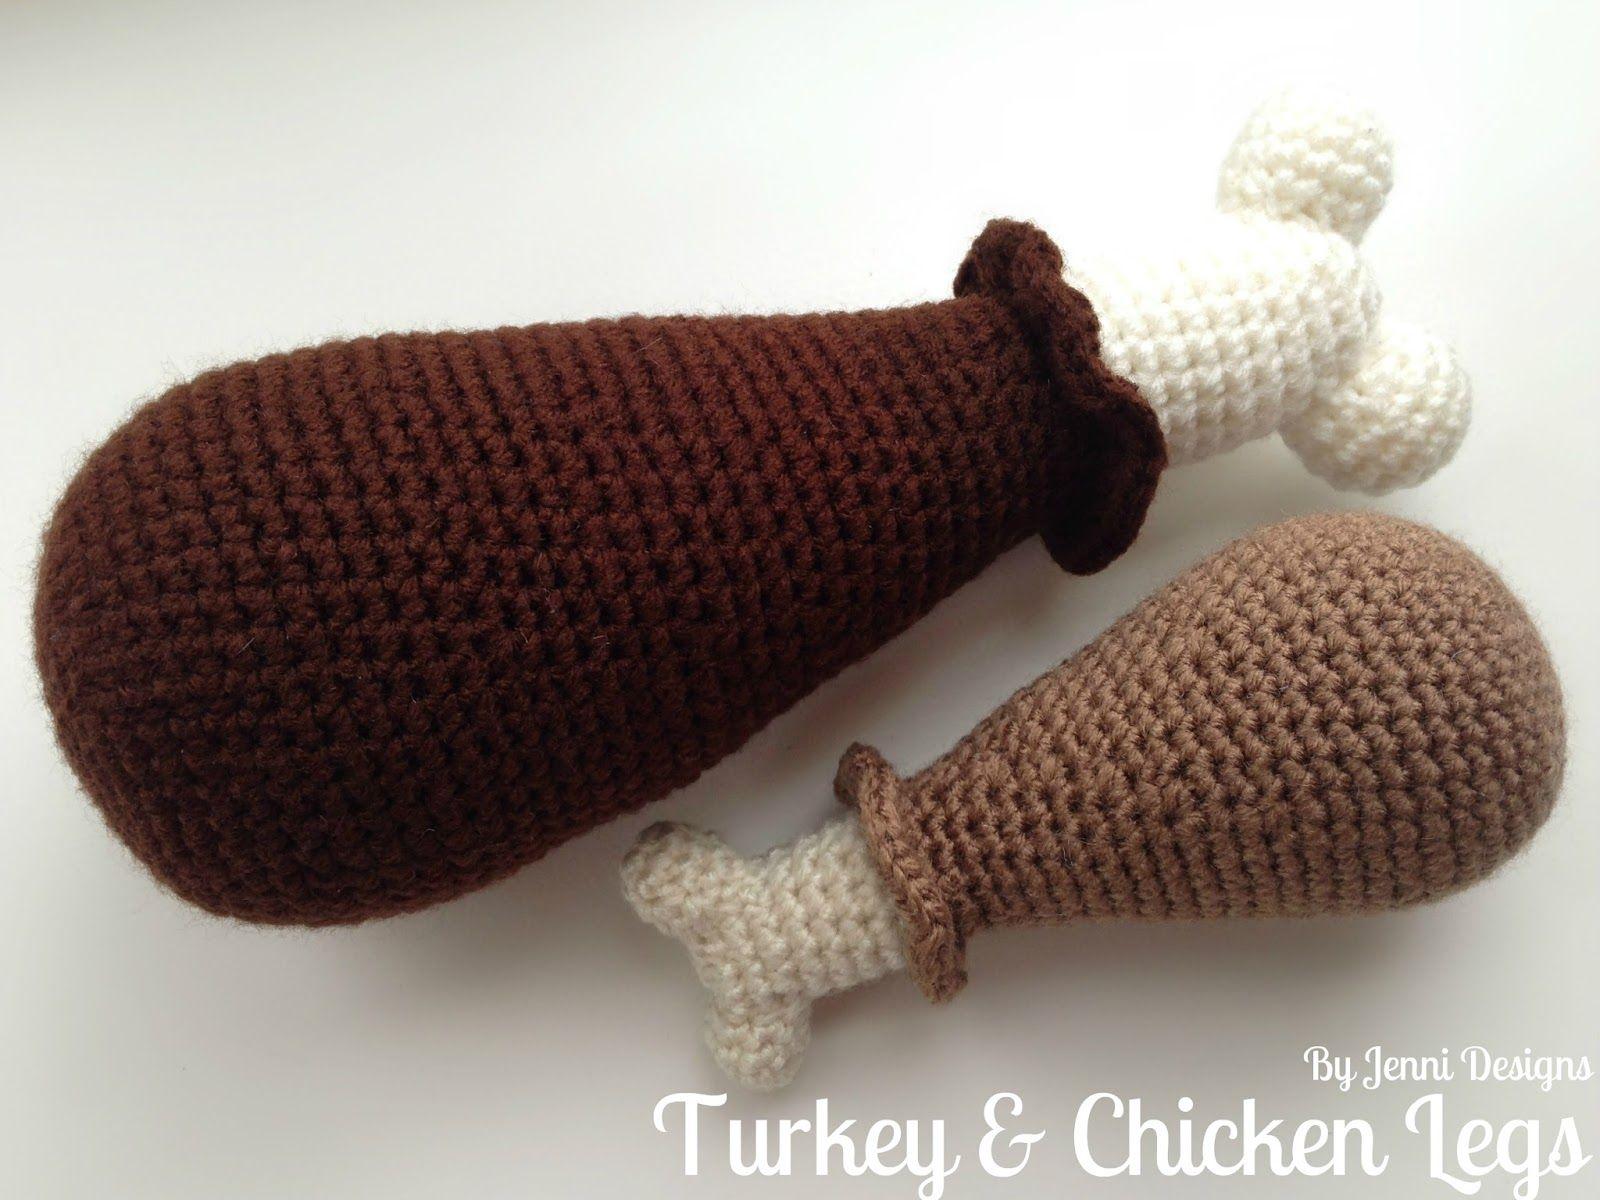 Free crochet amigurumi pattern turkey chicken legs crochet free crochet amigurumi pattern turkey chicken legs bankloansurffo Choice Image